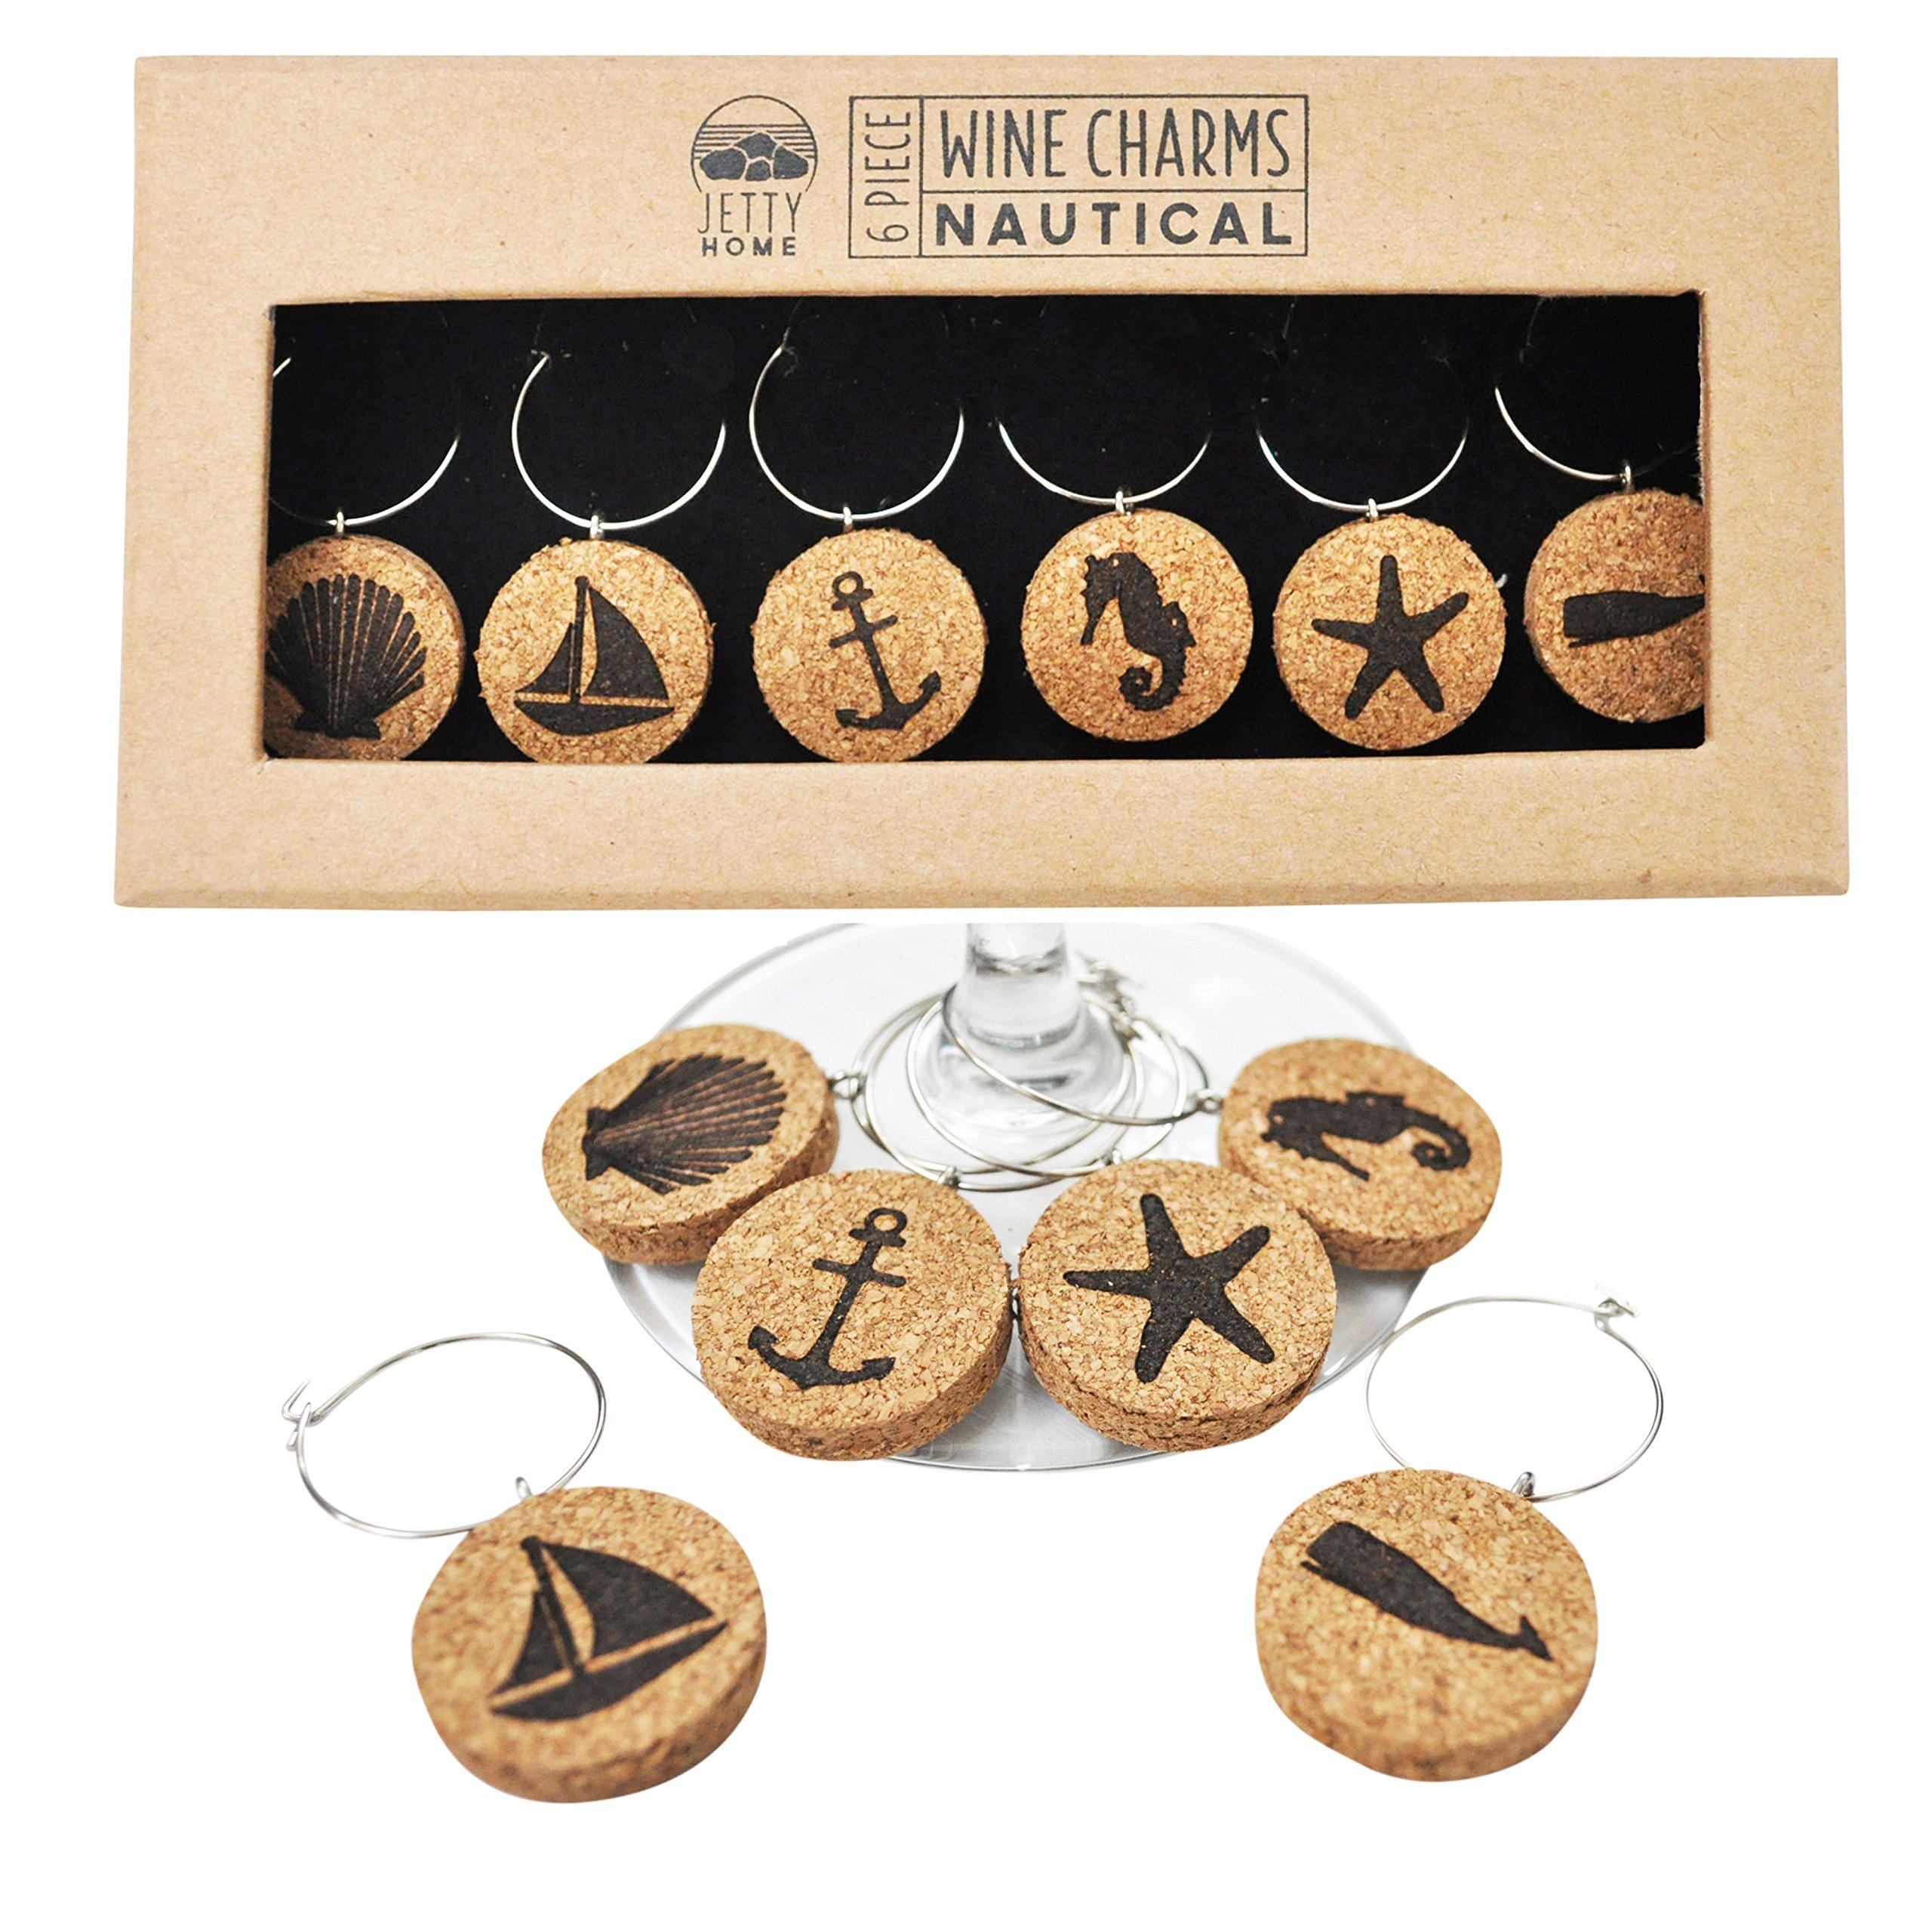 Jetty Home 6 Piece Nautical Beach Wine Glass Charm Gift Set, Cork